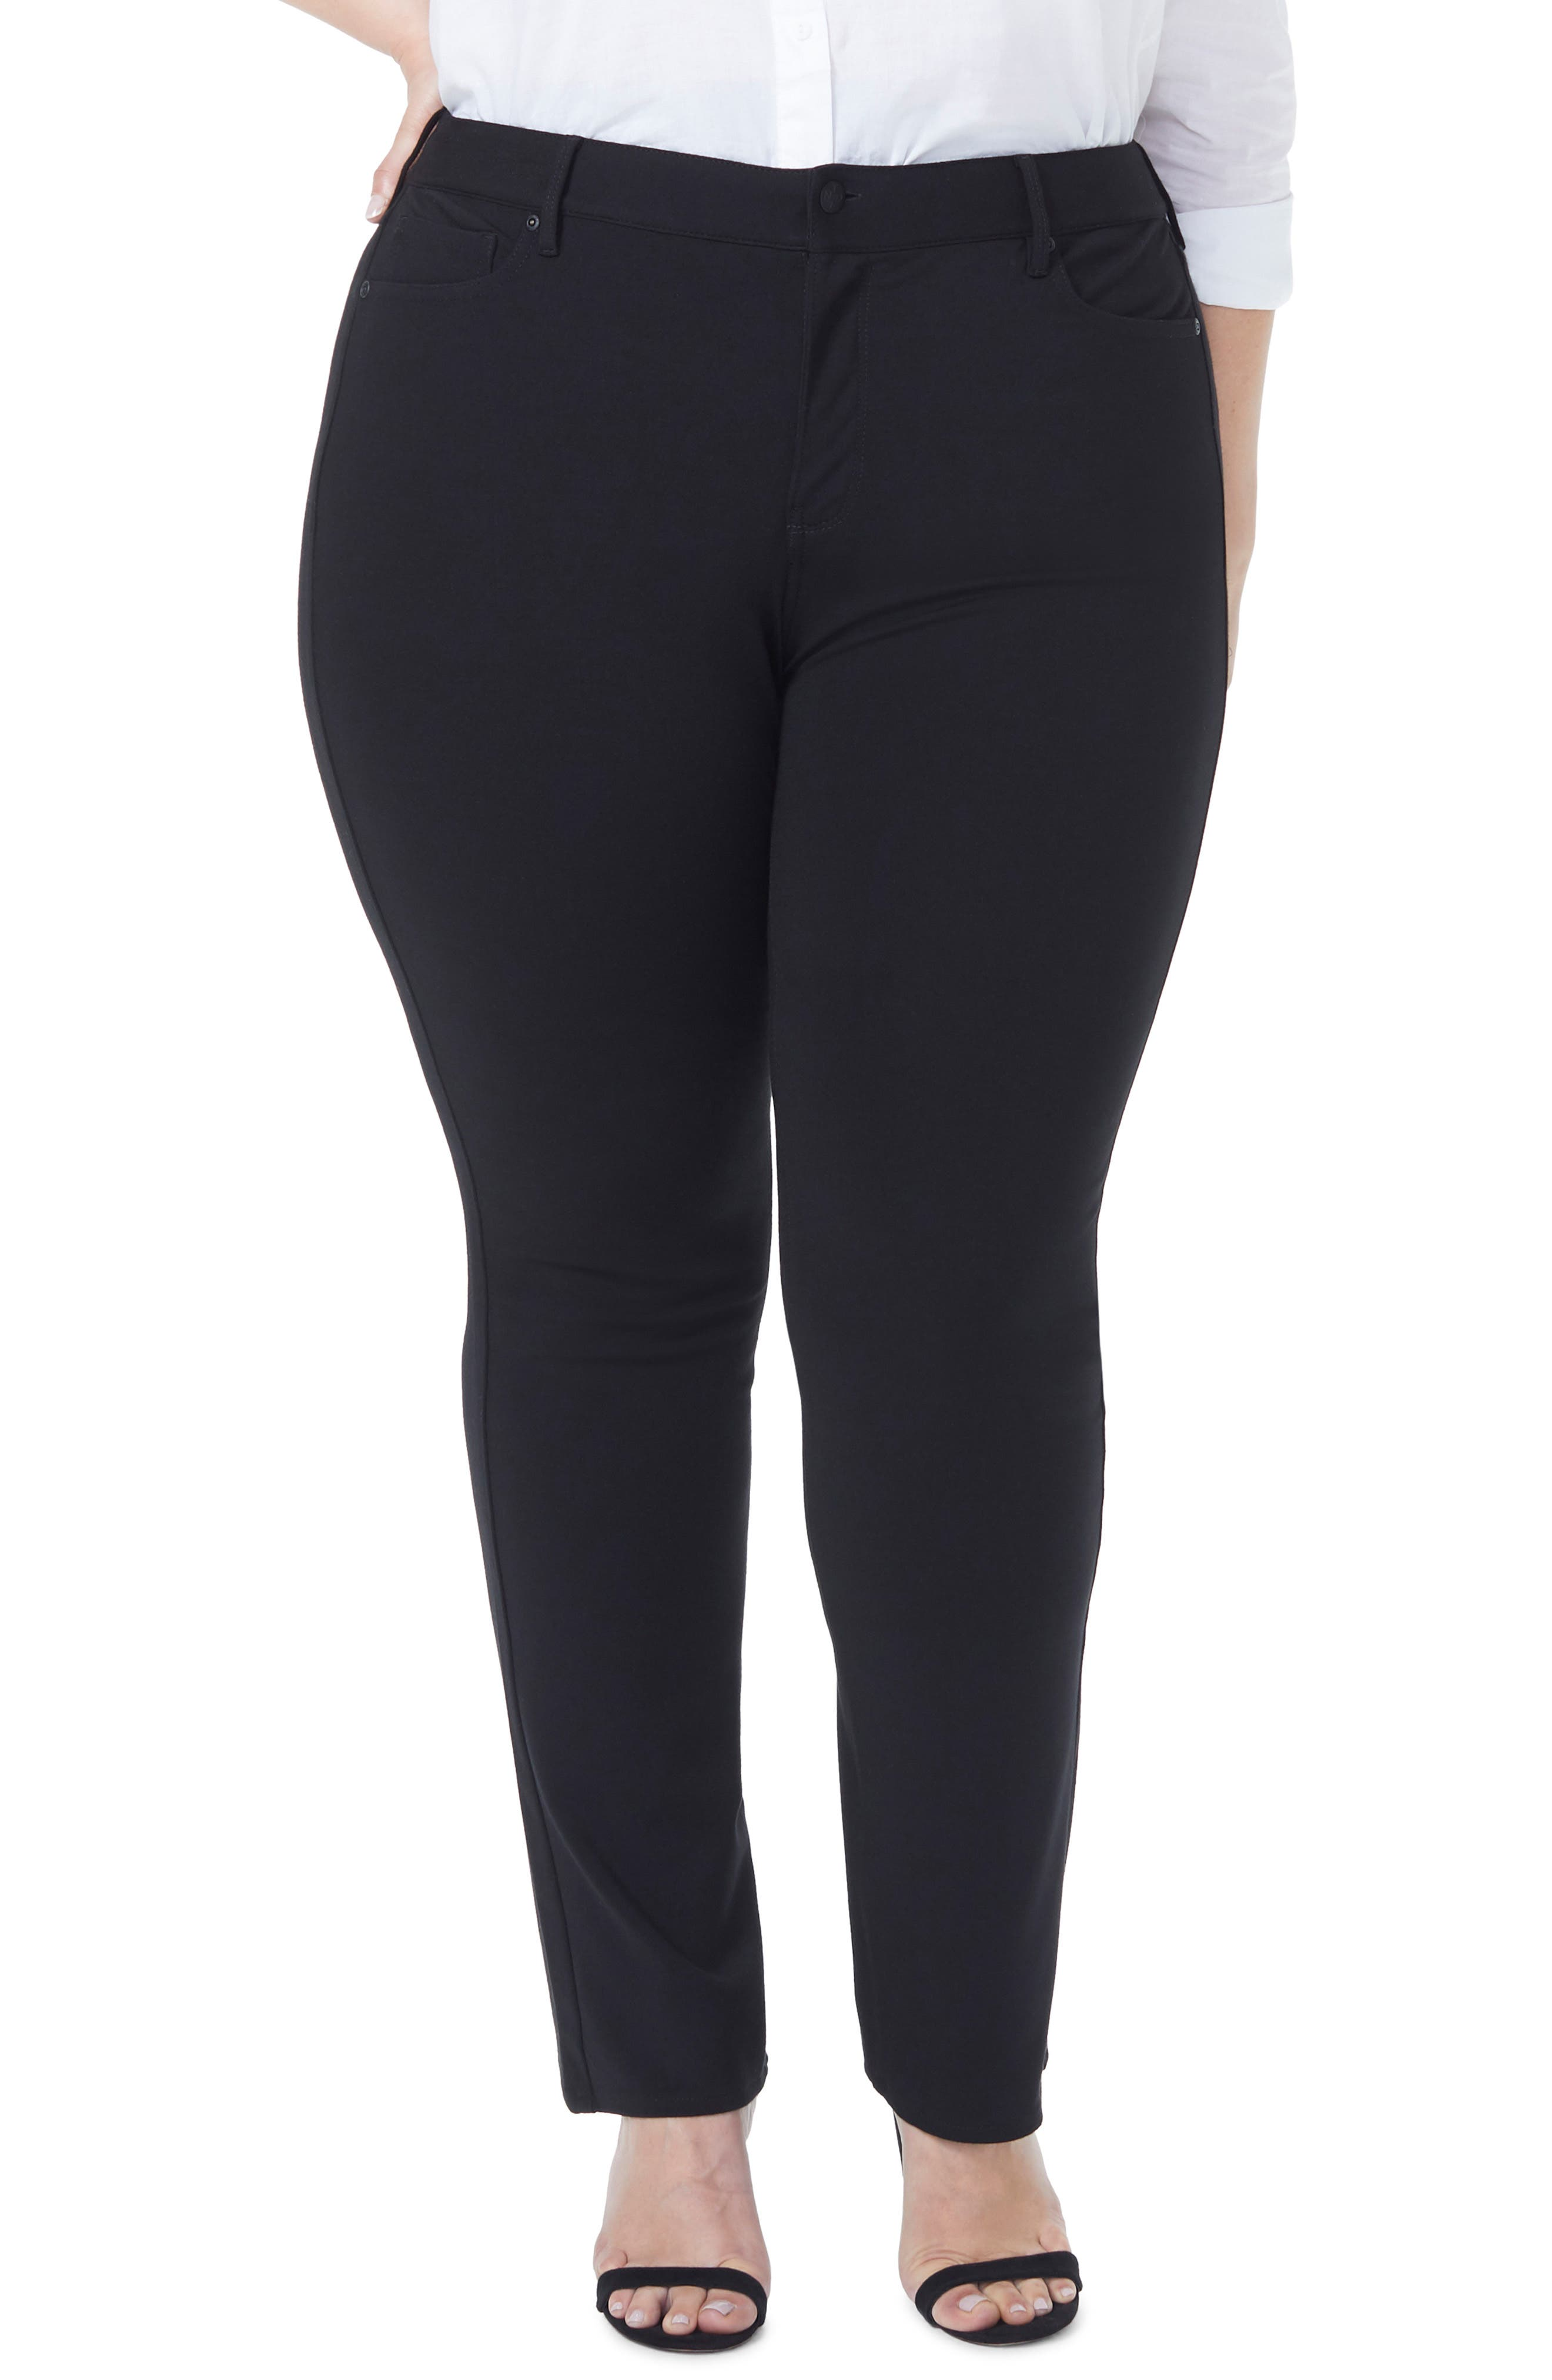 Marilyn Straight Ponte Knit Pants,                             Main thumbnail 1, color,                             BLACK